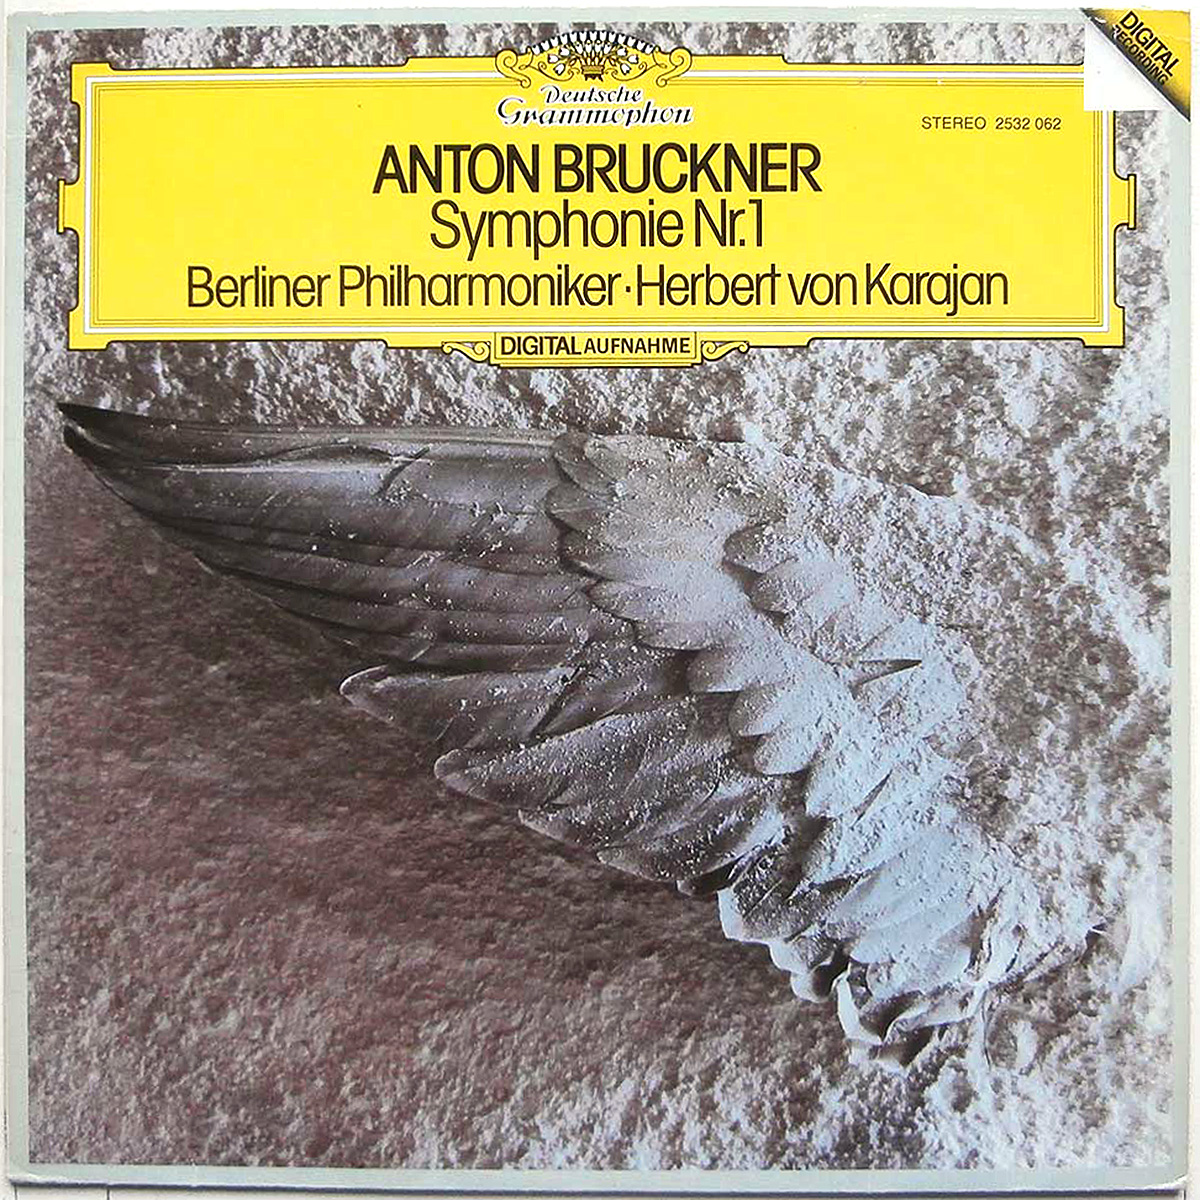 DGG 2532062_Bruckner Symphonie 1 Karajan DGG Digital Aufnahme